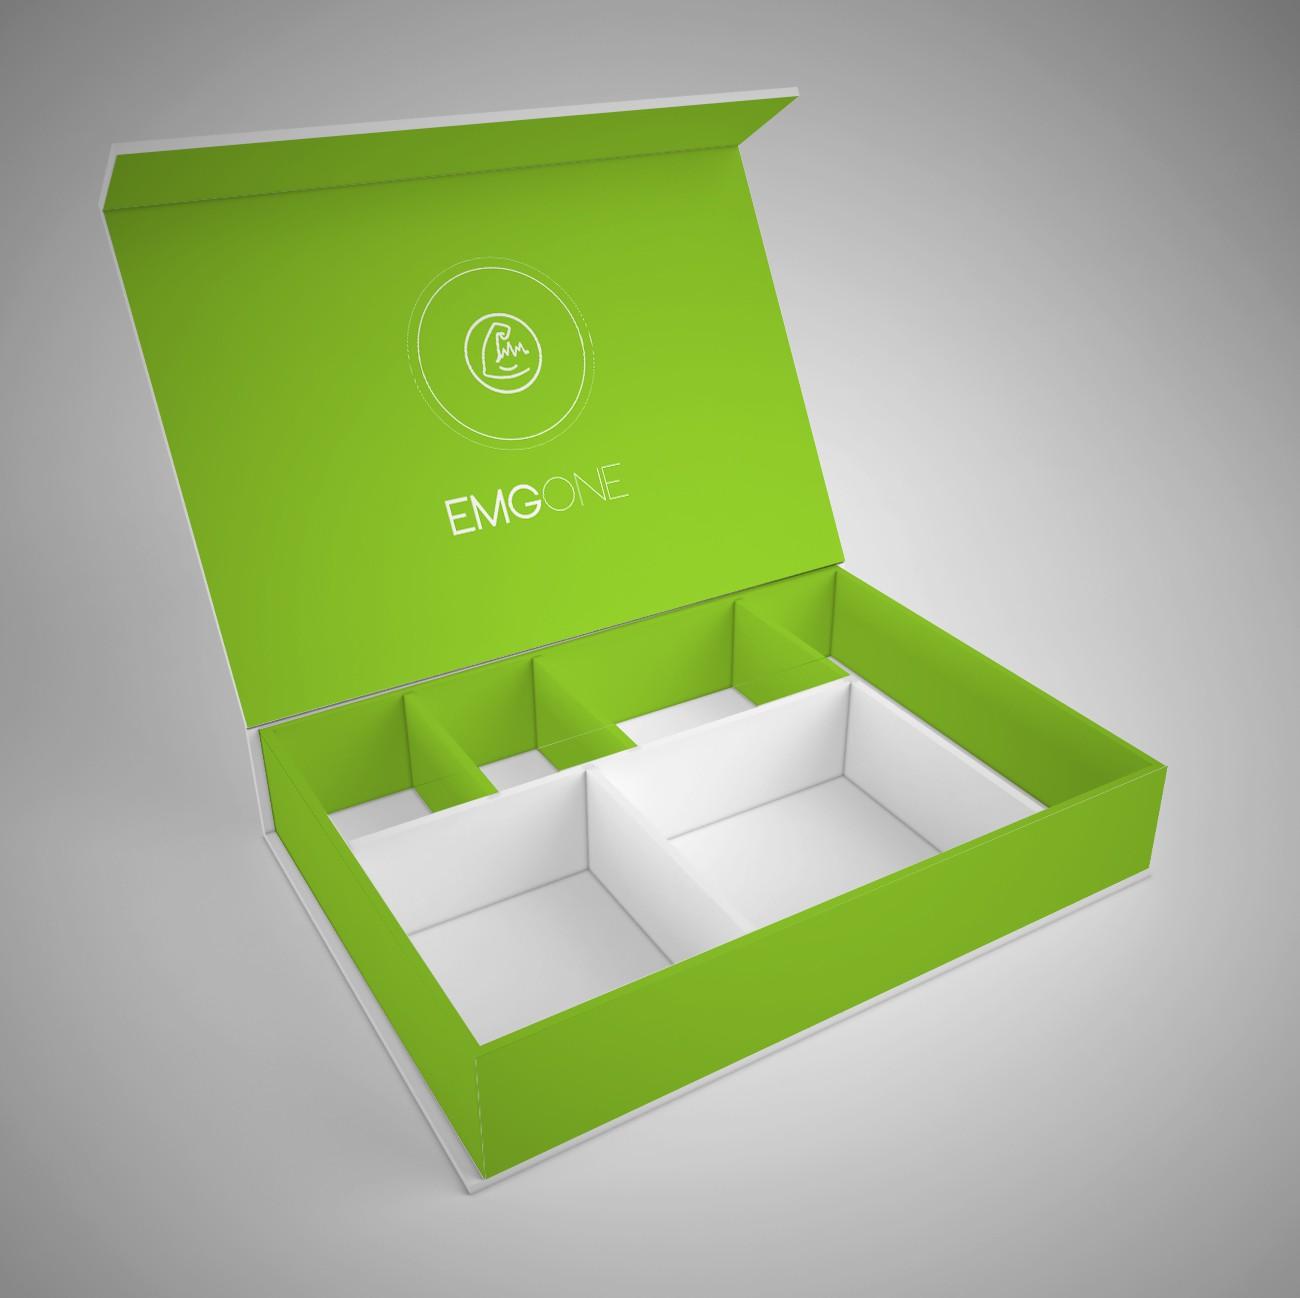 Diseña packaging para EmgOne, un sistema de rehabilitación portátil